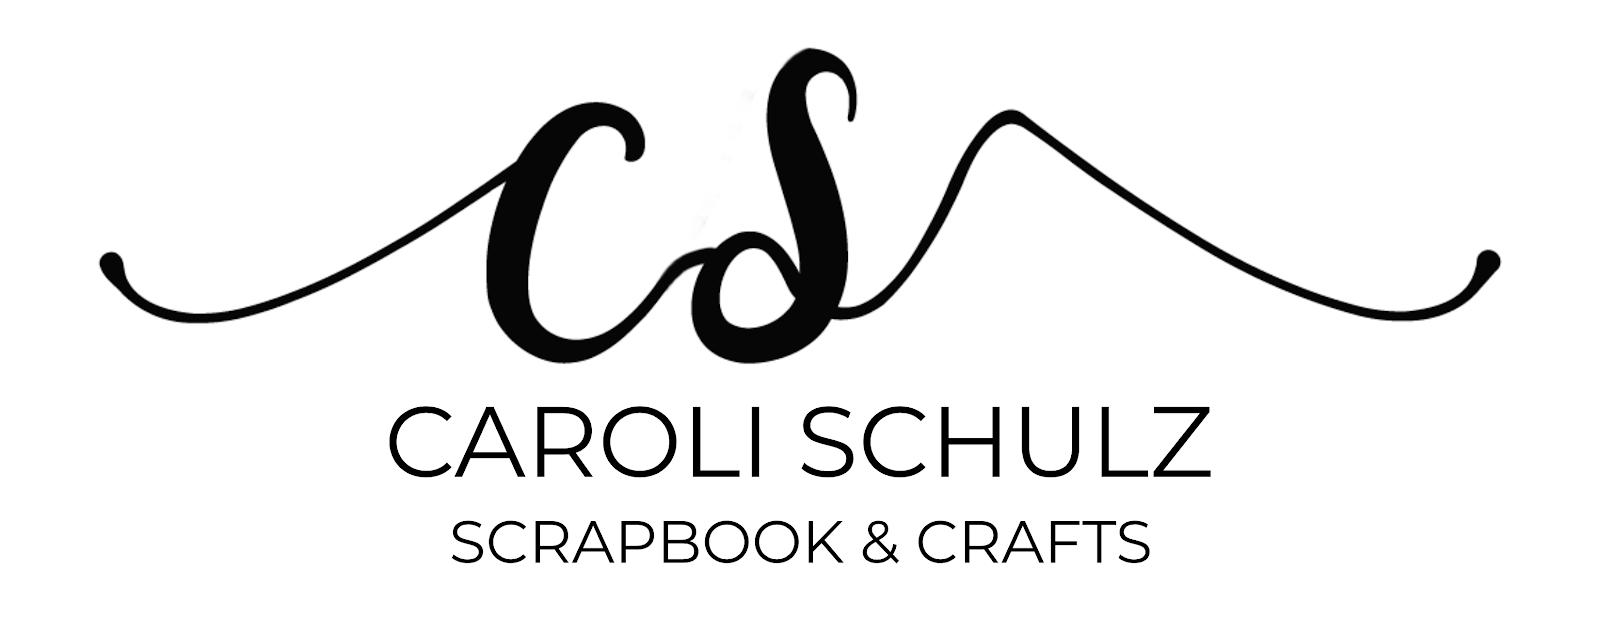 Caroli Schulz Scrapbook & Crafts